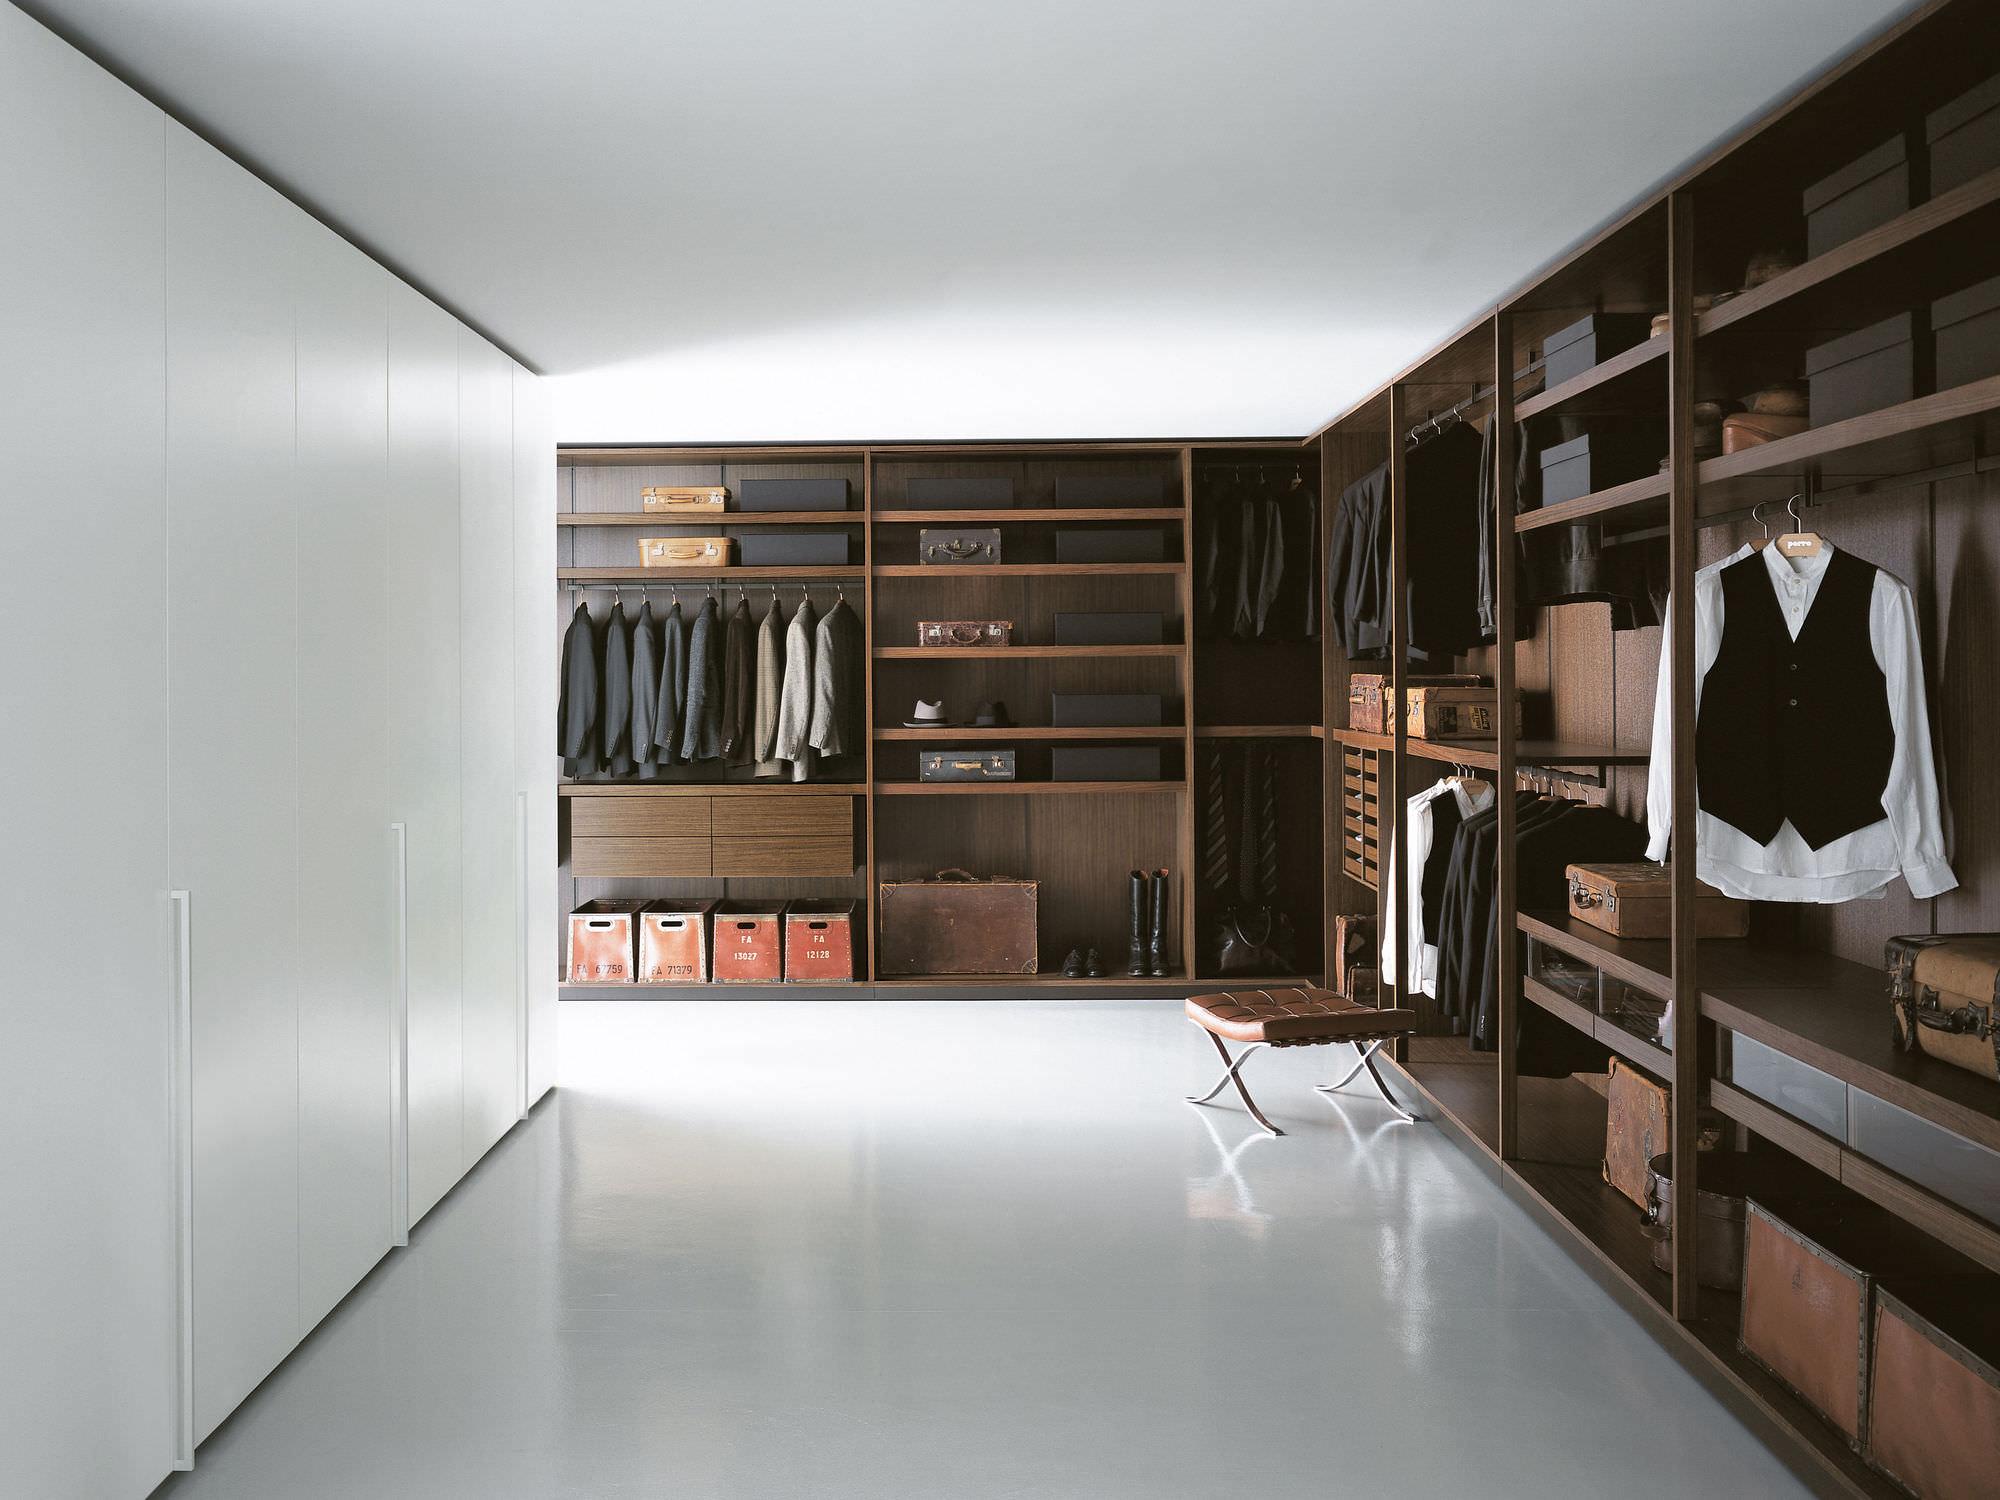 cabine-armadio-legno-piero-lissoni-49622-5729059.jpg